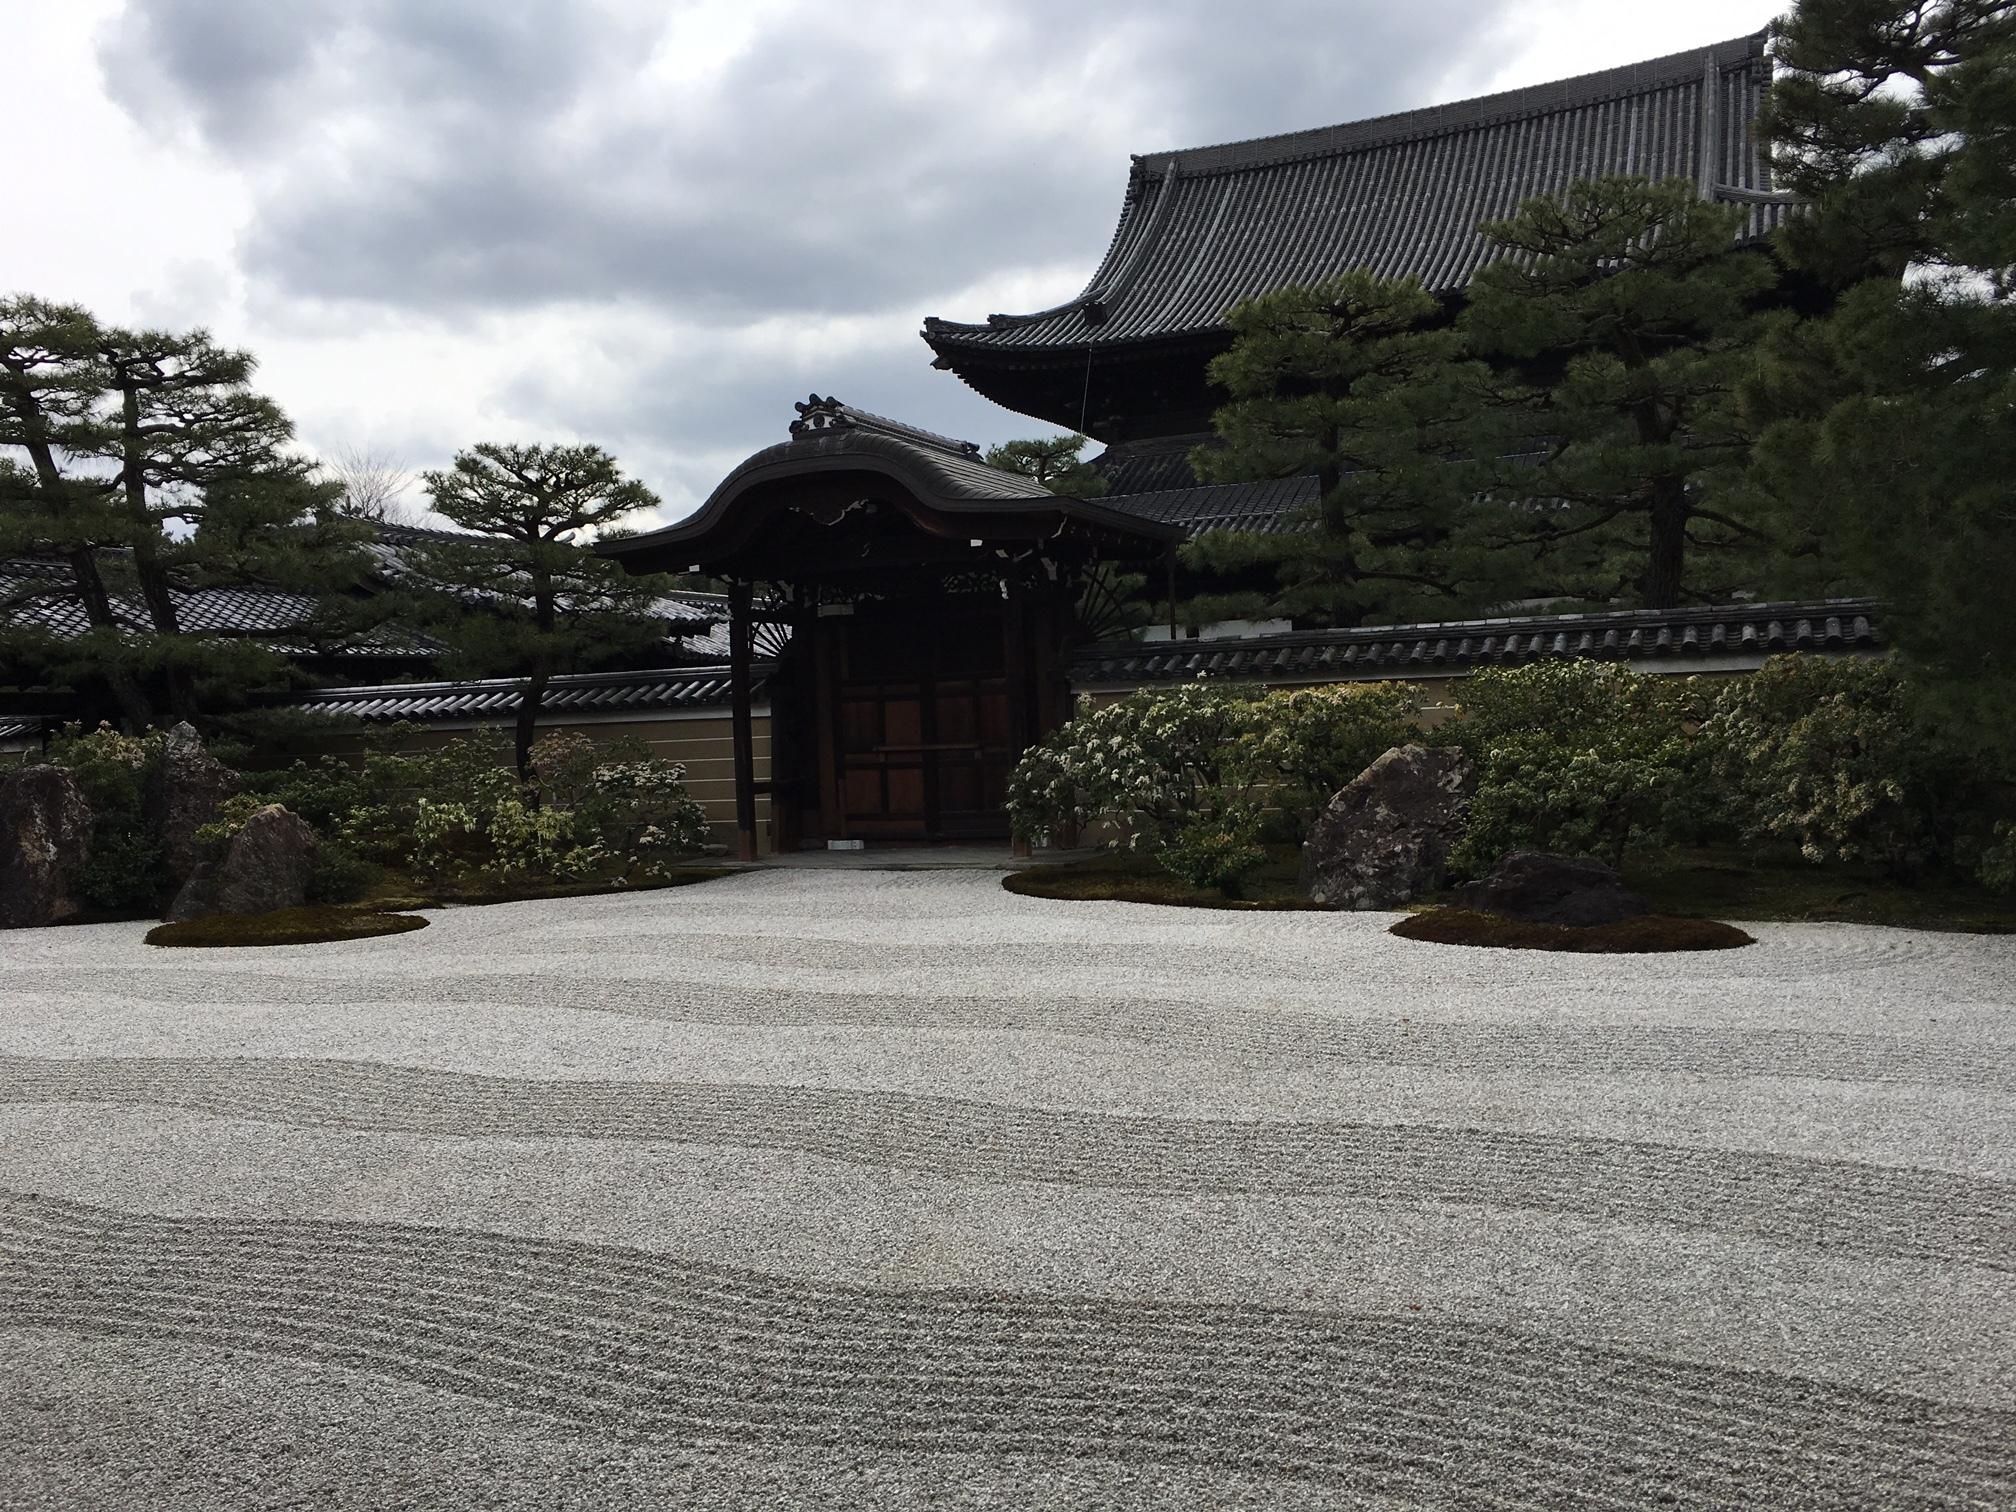 DEMYLEEのワンピースと京都_1_5-3